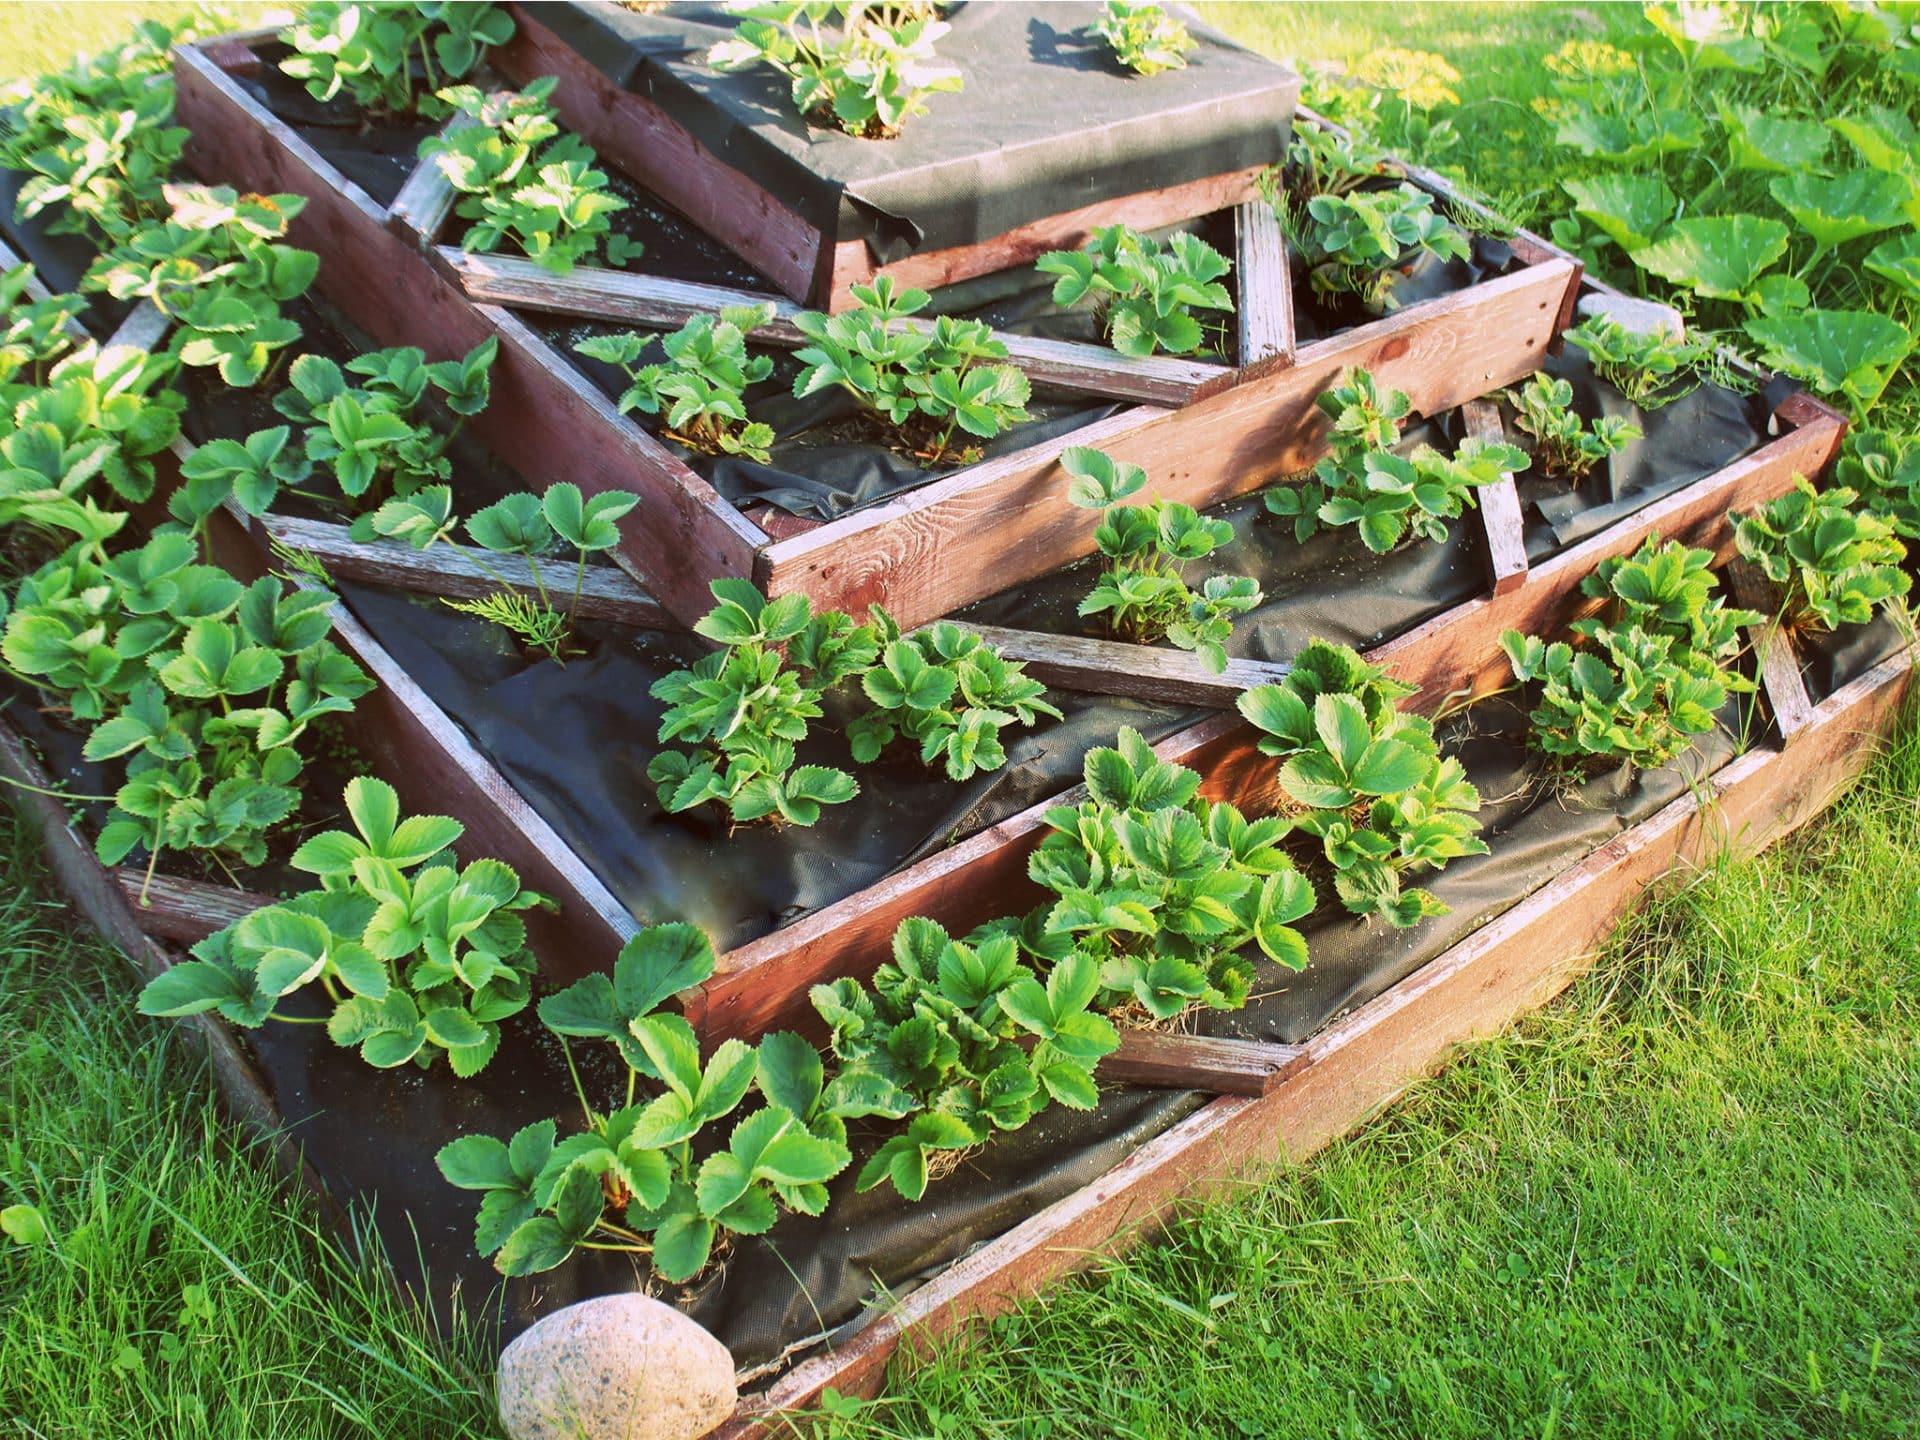 Erdbeeren in einem Stufenbeet © vaivirga - depositphotos